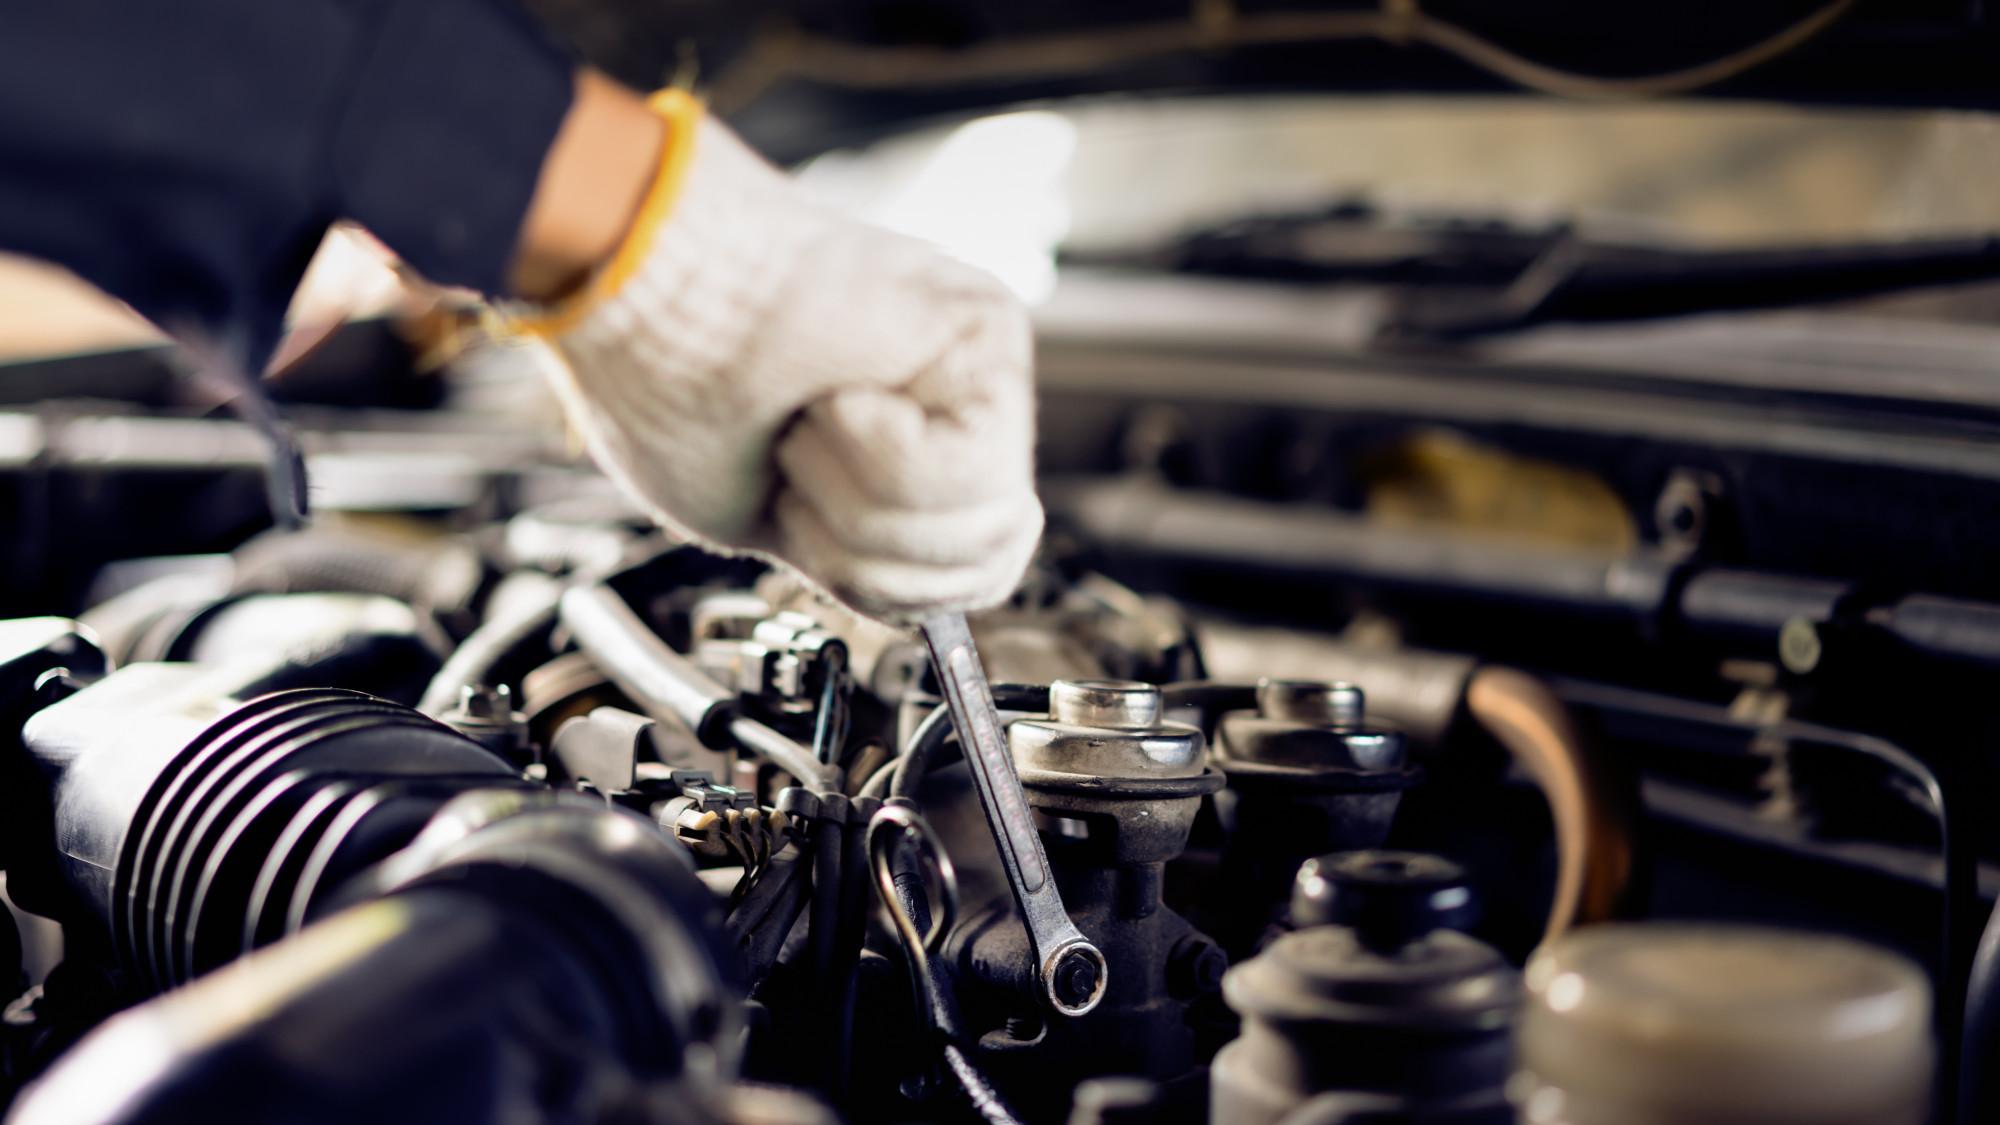 person performing DIY car maintenance